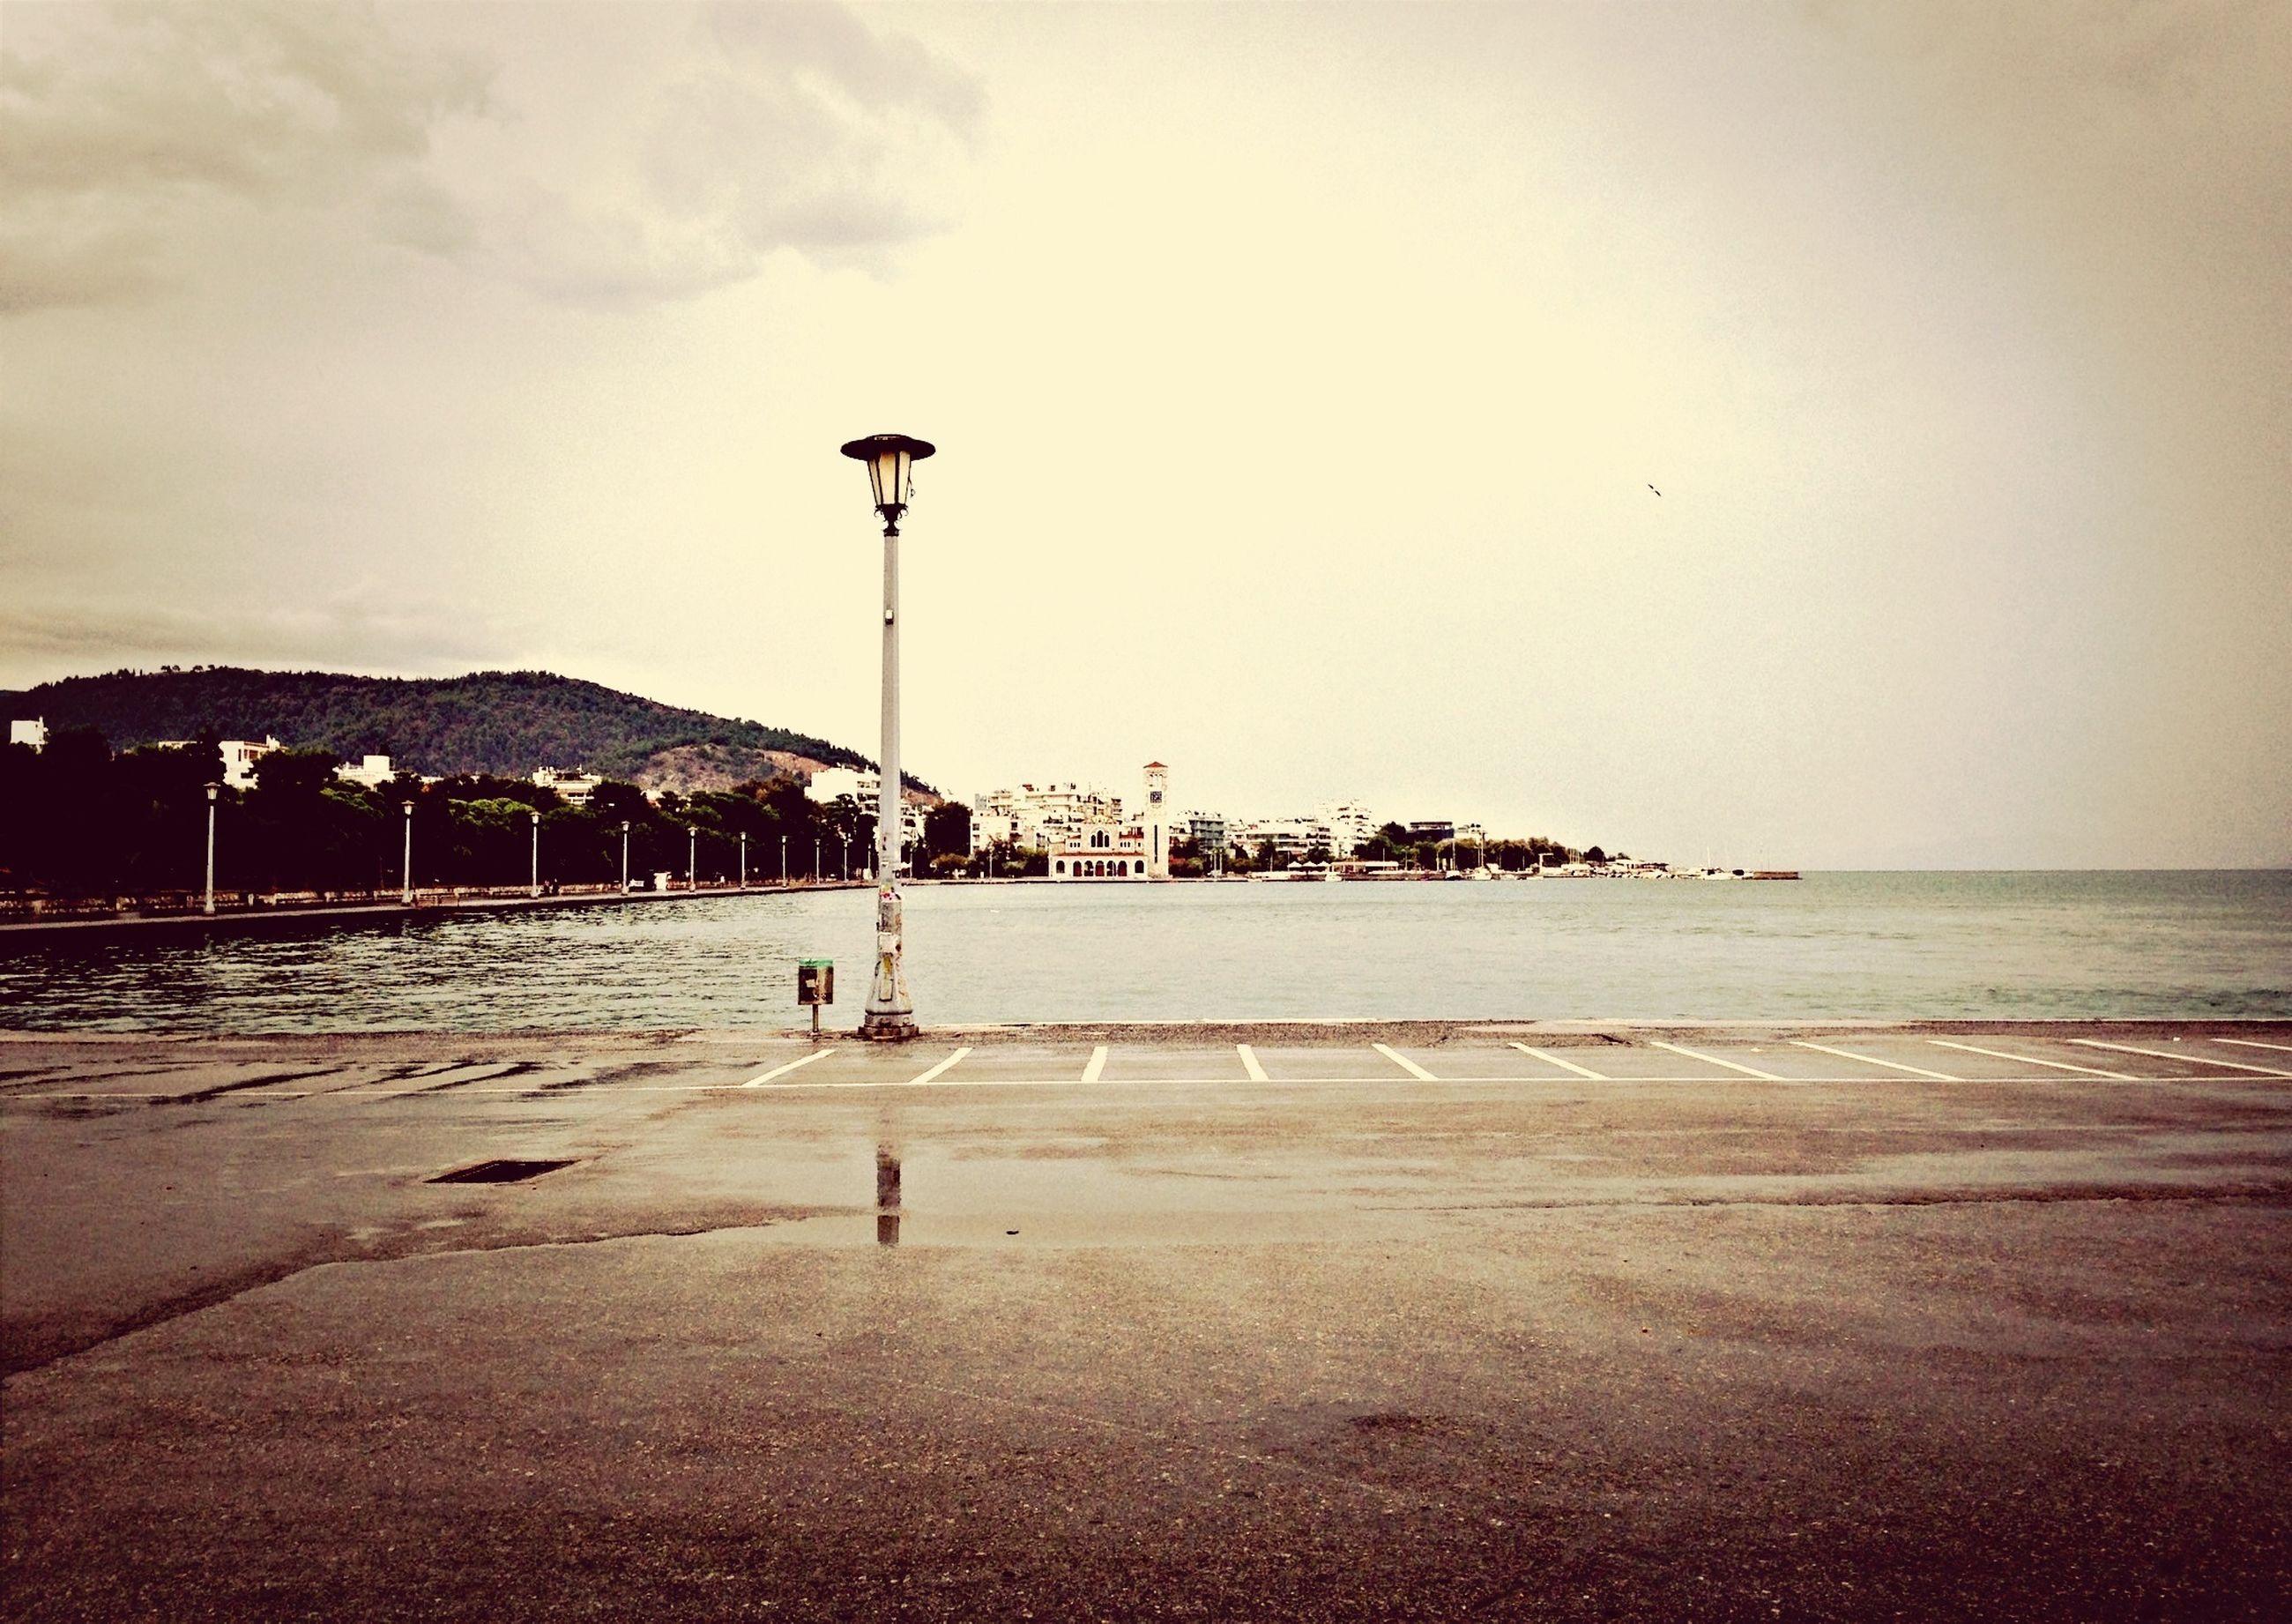 sea, beach, water, shore, sand, sky, horizon over water, street light, scenics, tranquility, tranquil scene, beauty in nature, nature, incidental people, idyllic, coastline, outdoors, cloud - sky, lighting equipment, silhouette